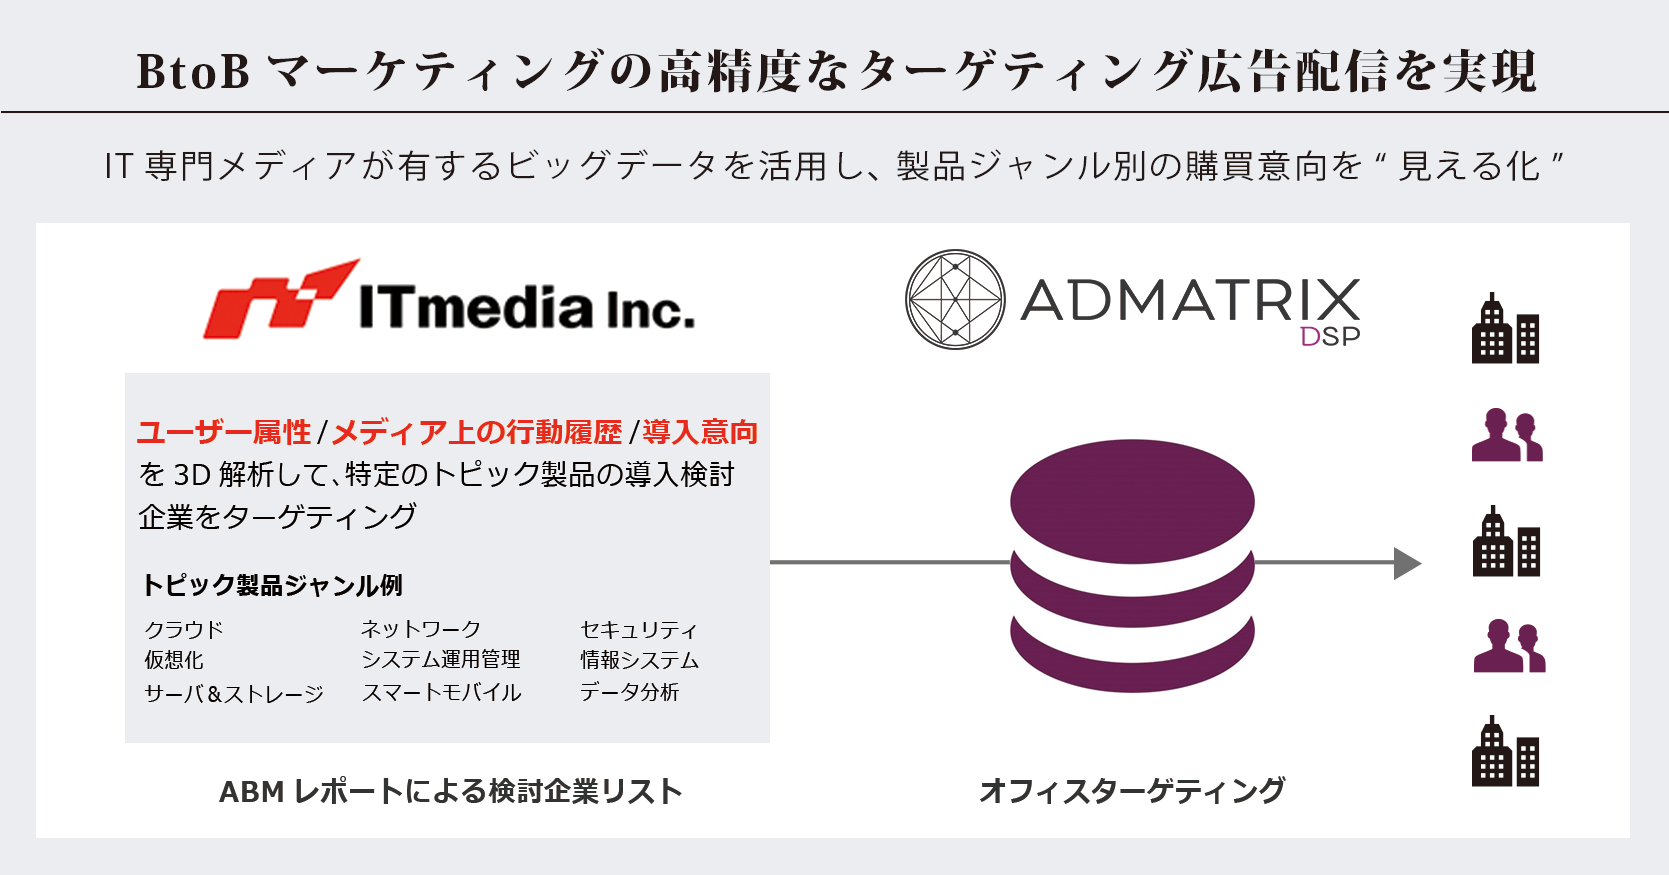 20180515_dsp_ITmedia_05